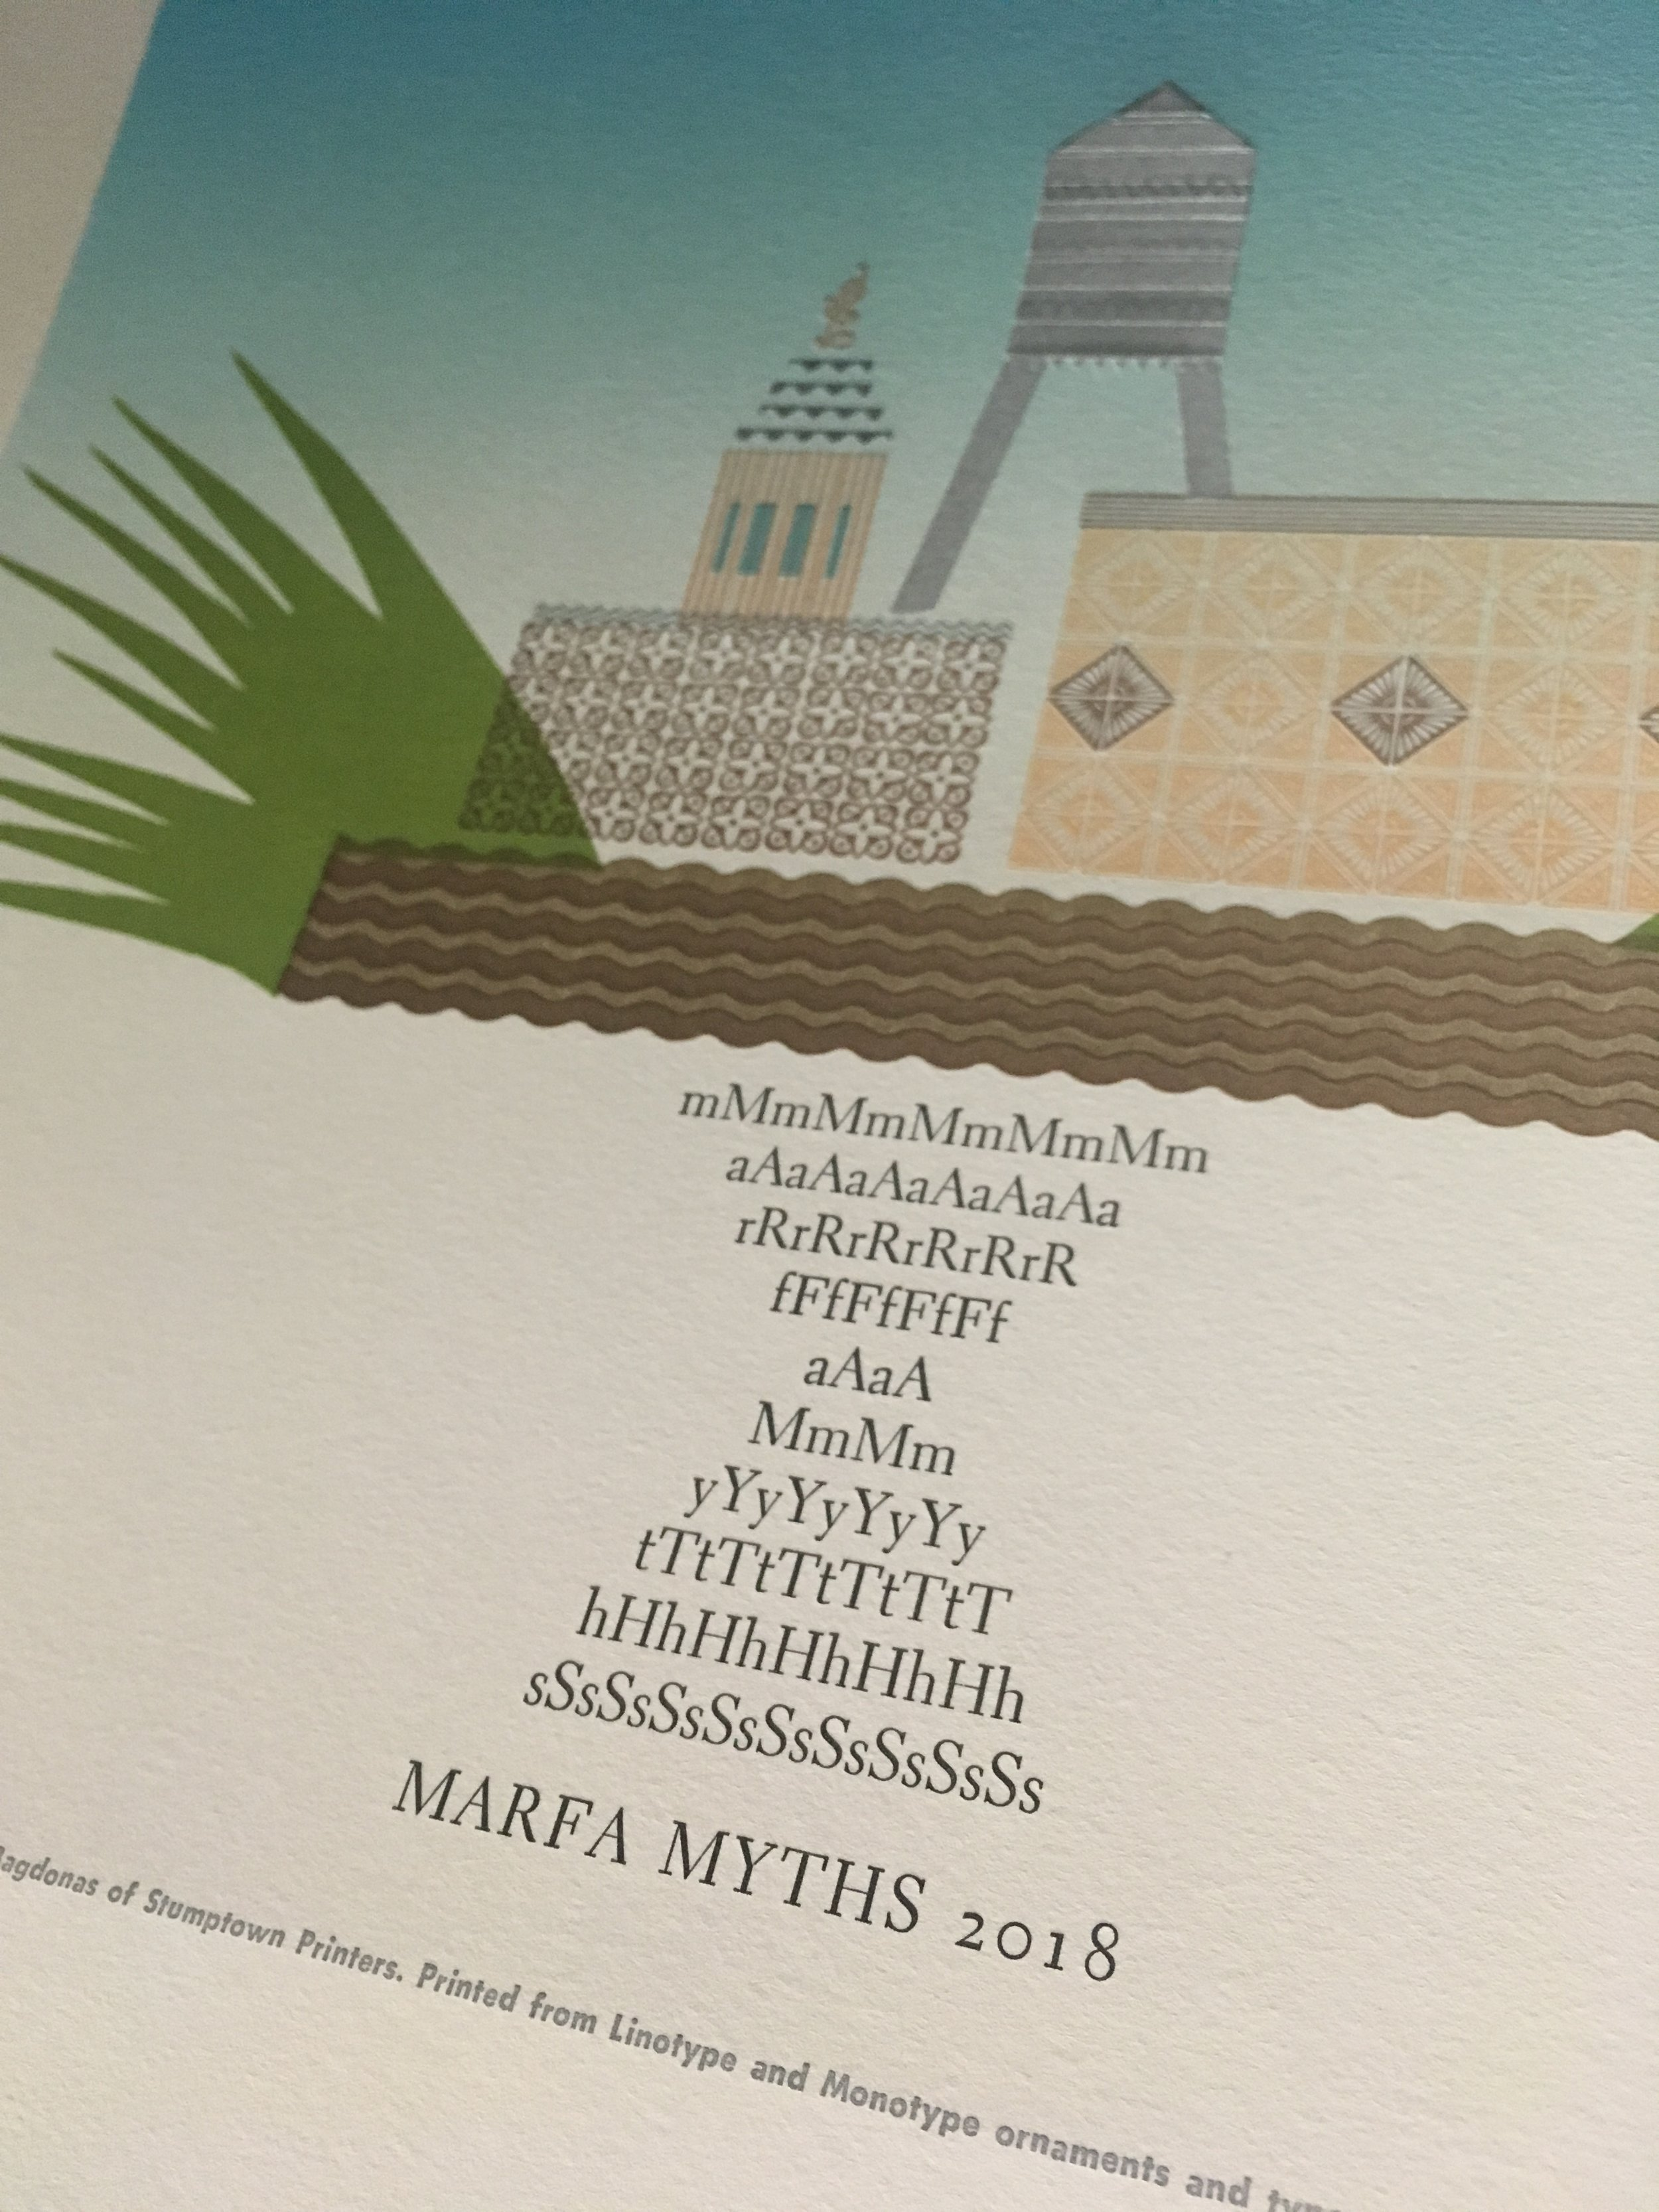 Marfa Myths Limited Edition Print 1.JPG